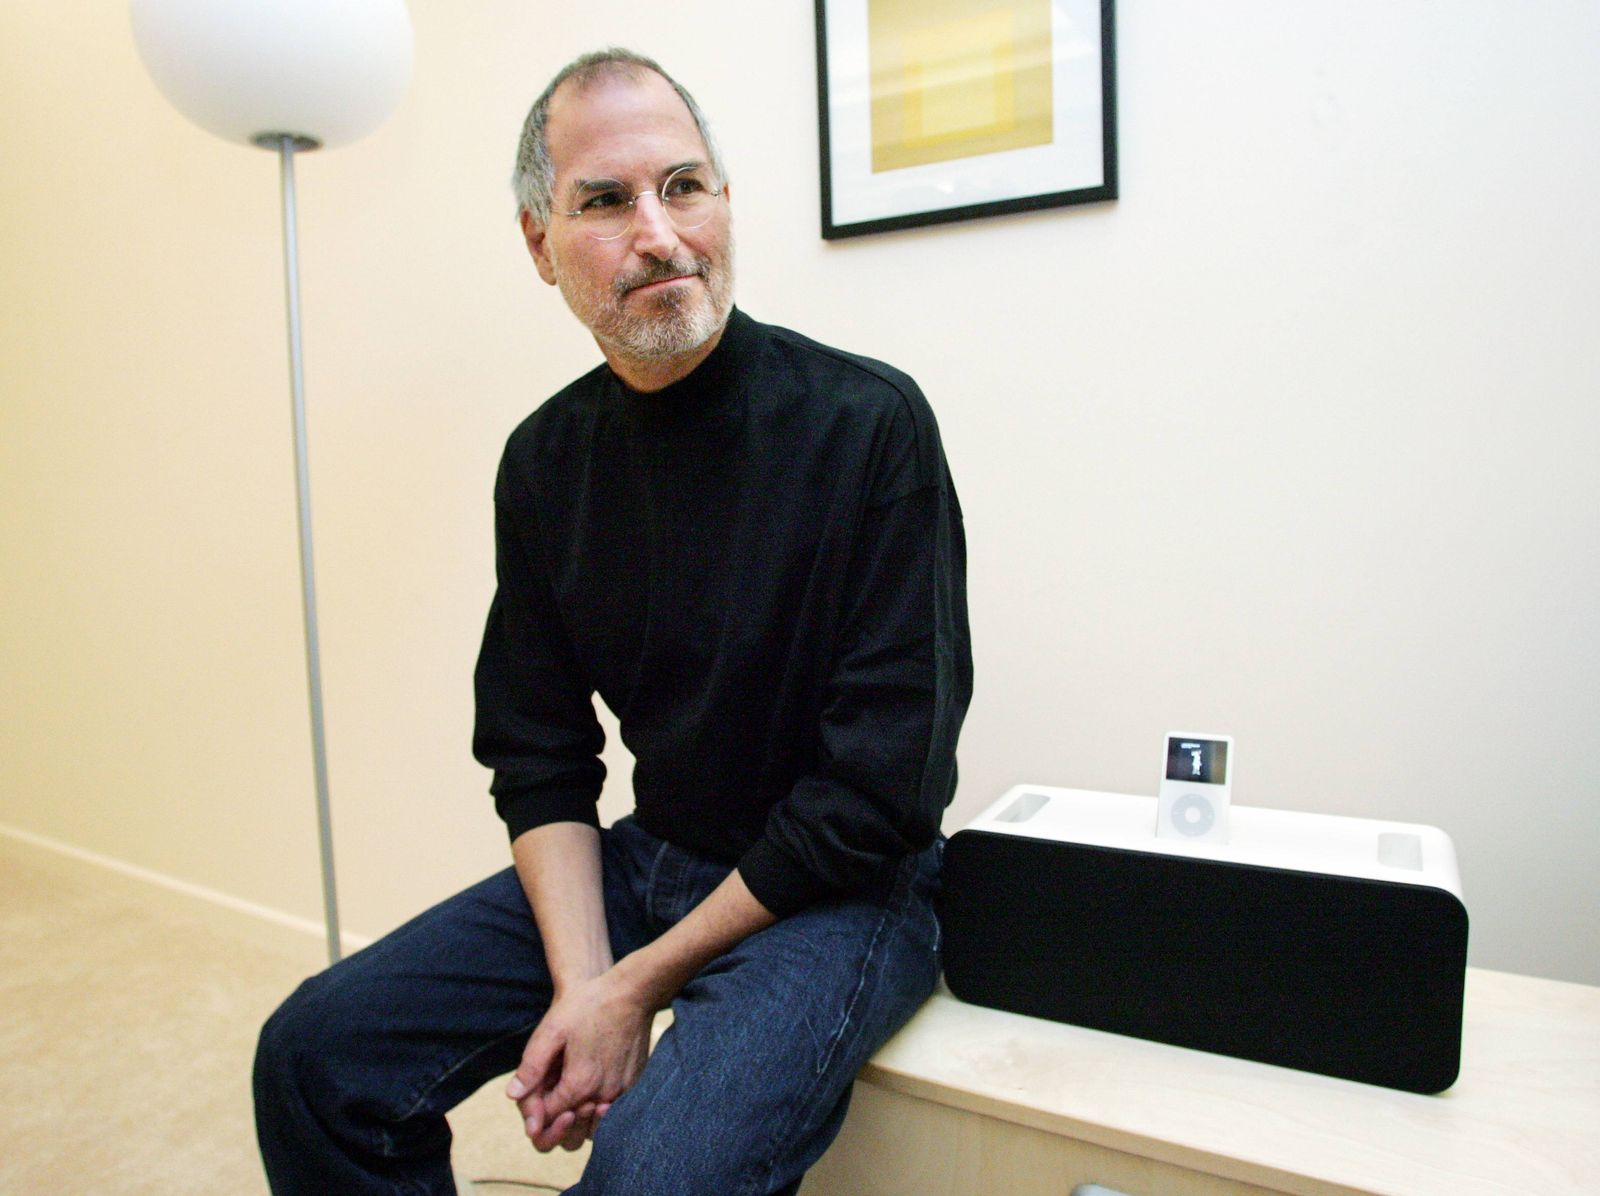 Steve Jobs iPod Hifi